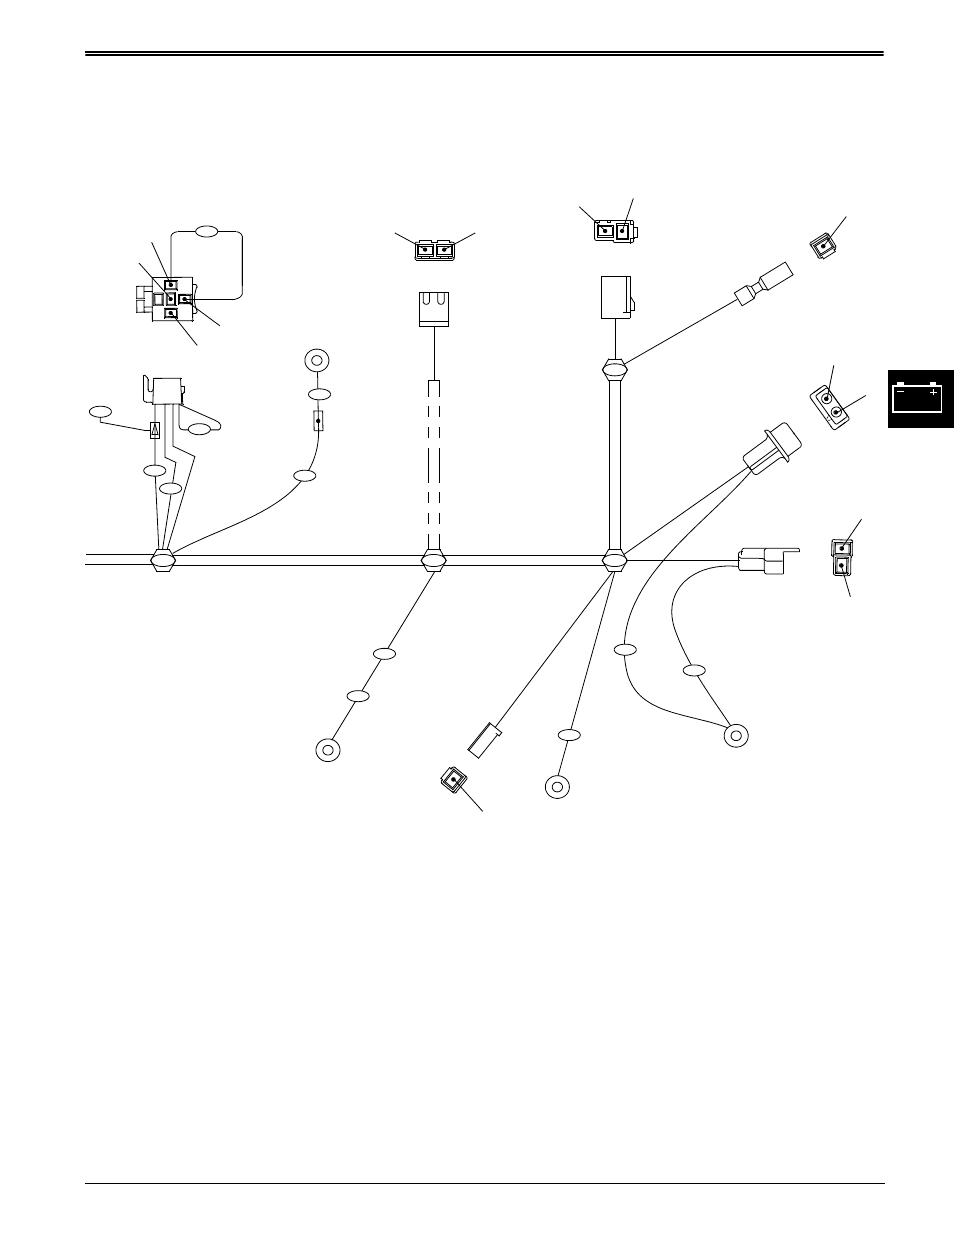 medium resolution of wiring harness diagrams electrical john deere stx38 user manual john deere 314 wiring harness diagram